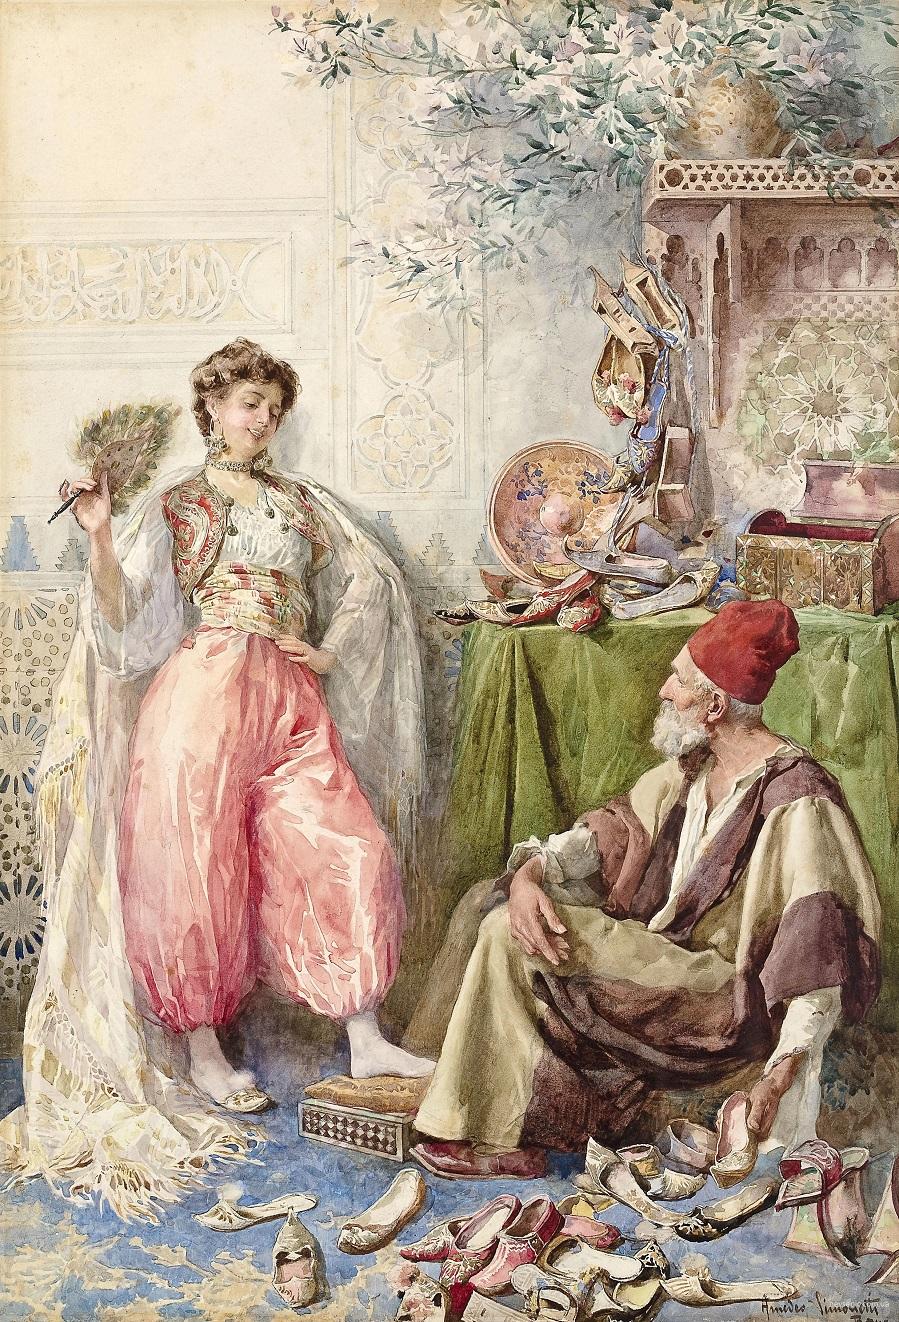 The harem's cobbler